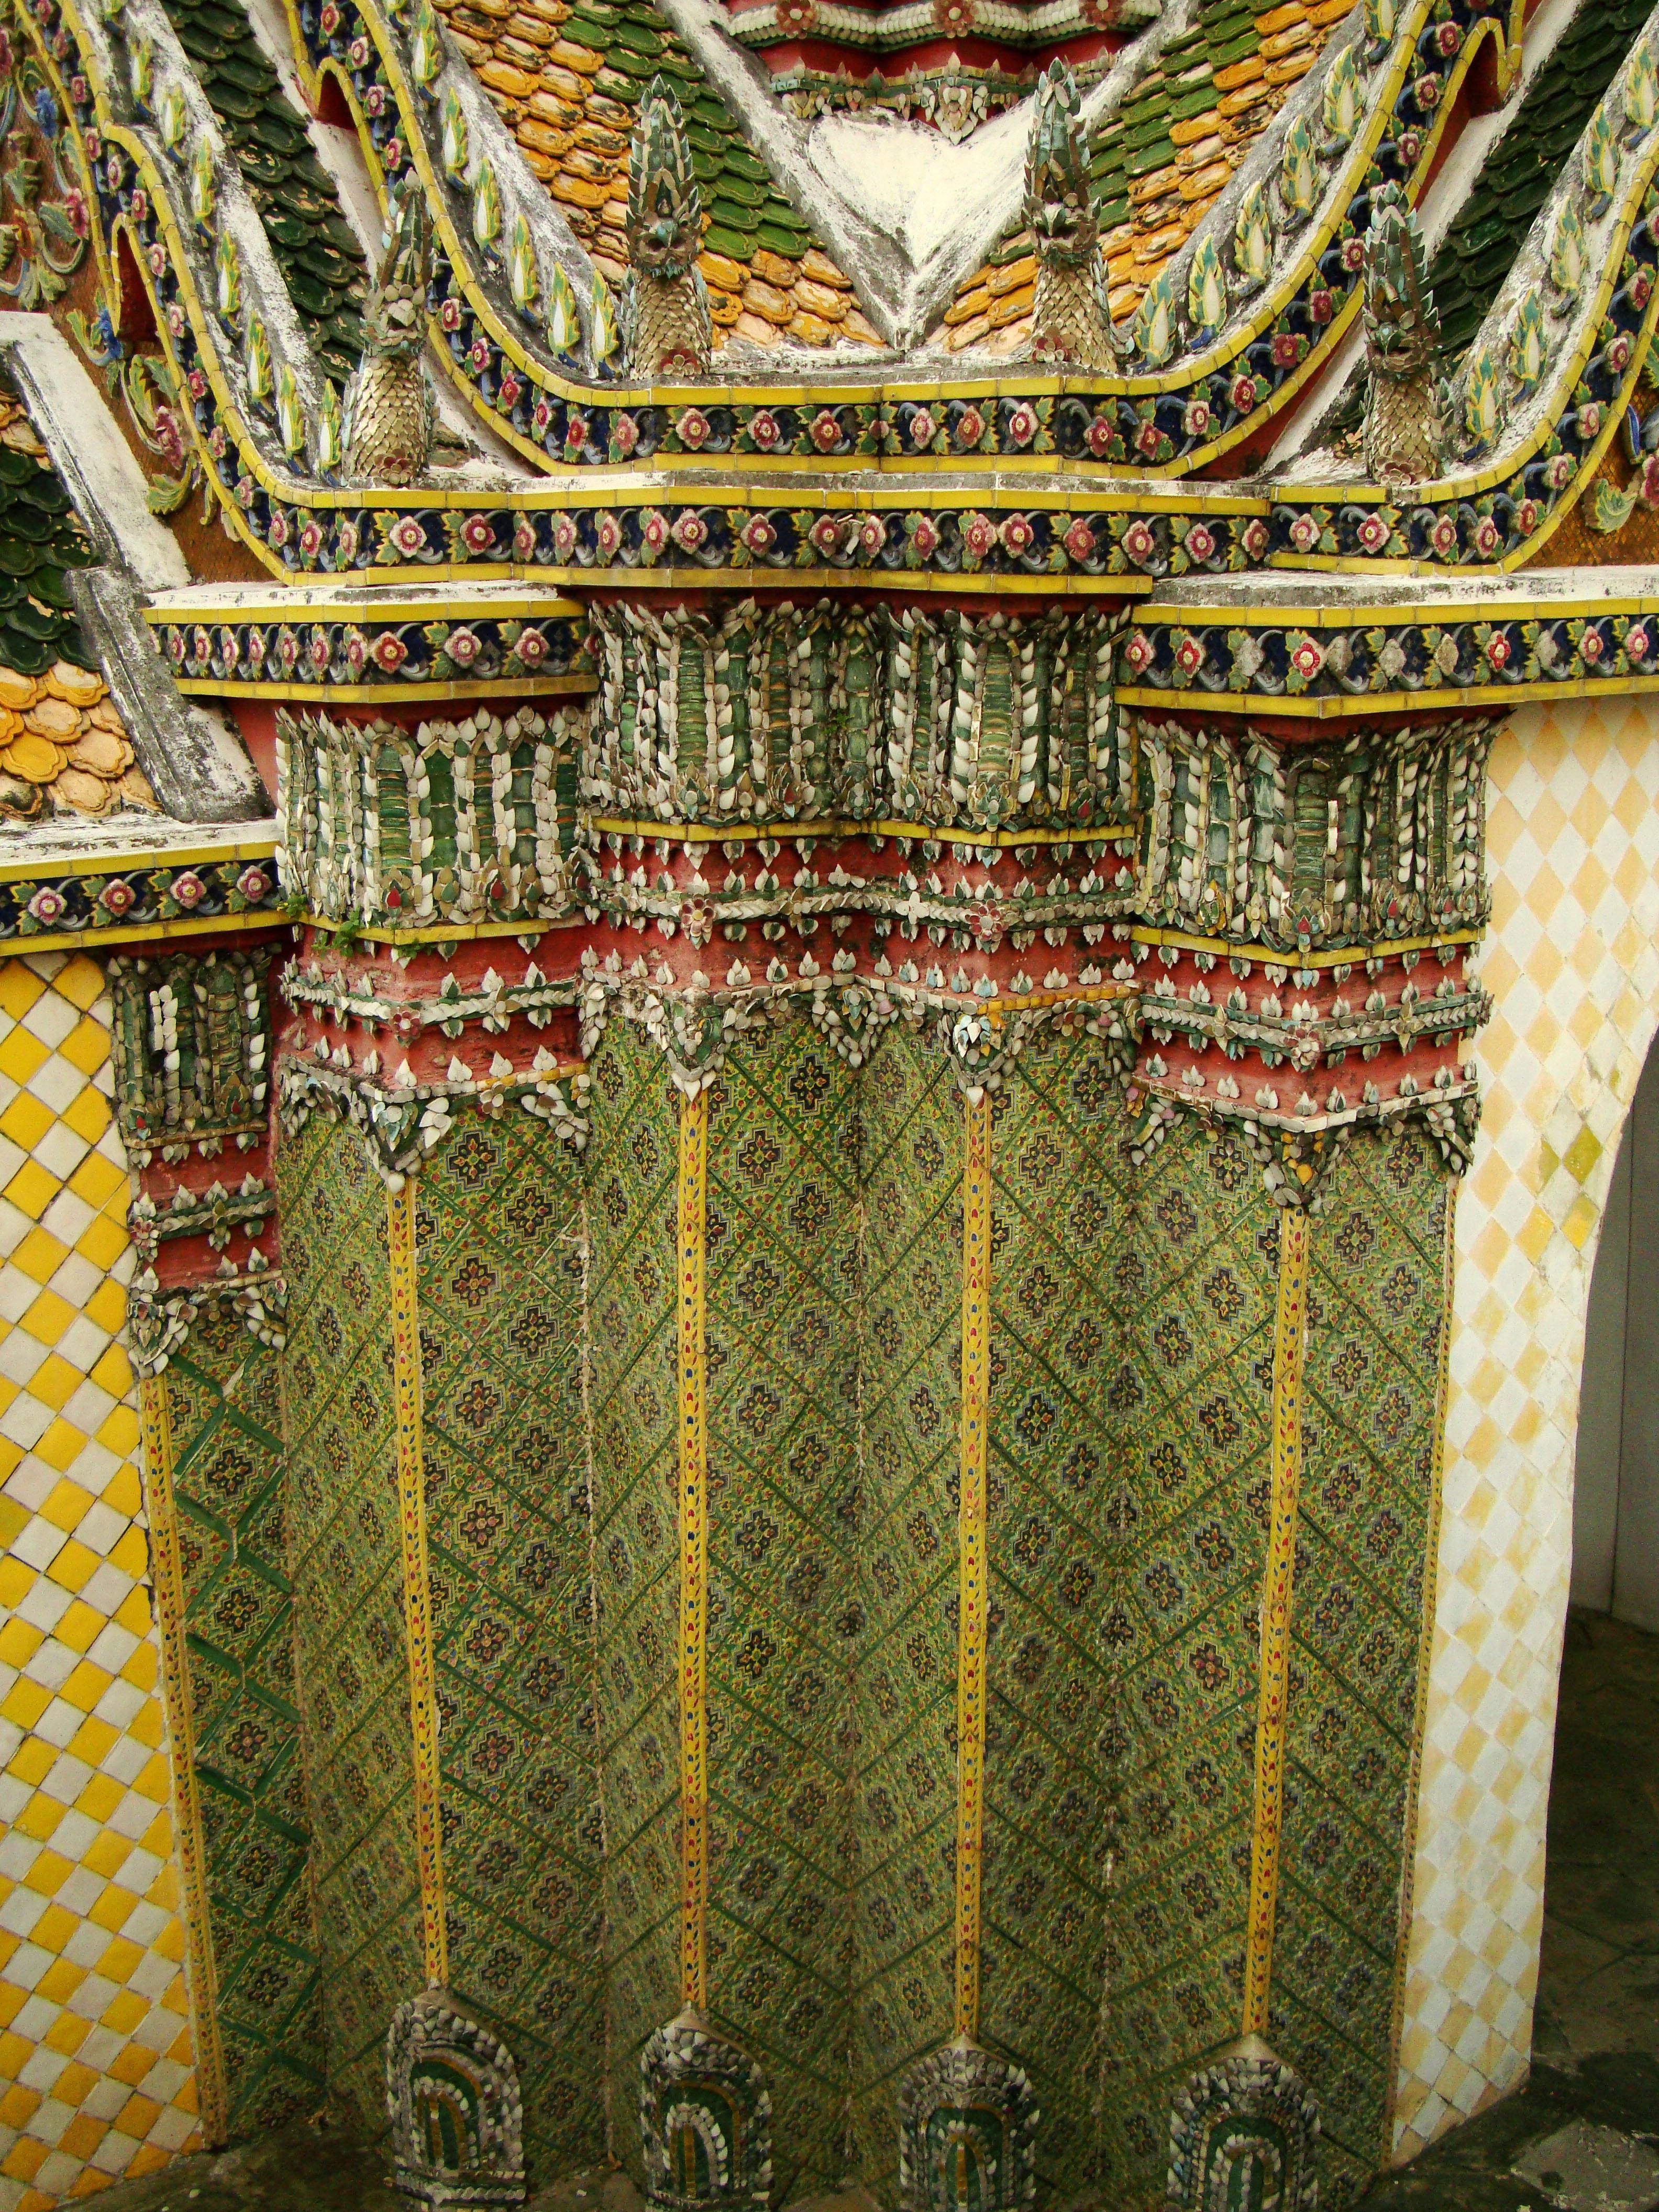 05 Phra Wiharn Yod intercrit designed walls and pillars Grand Palace 2010 02